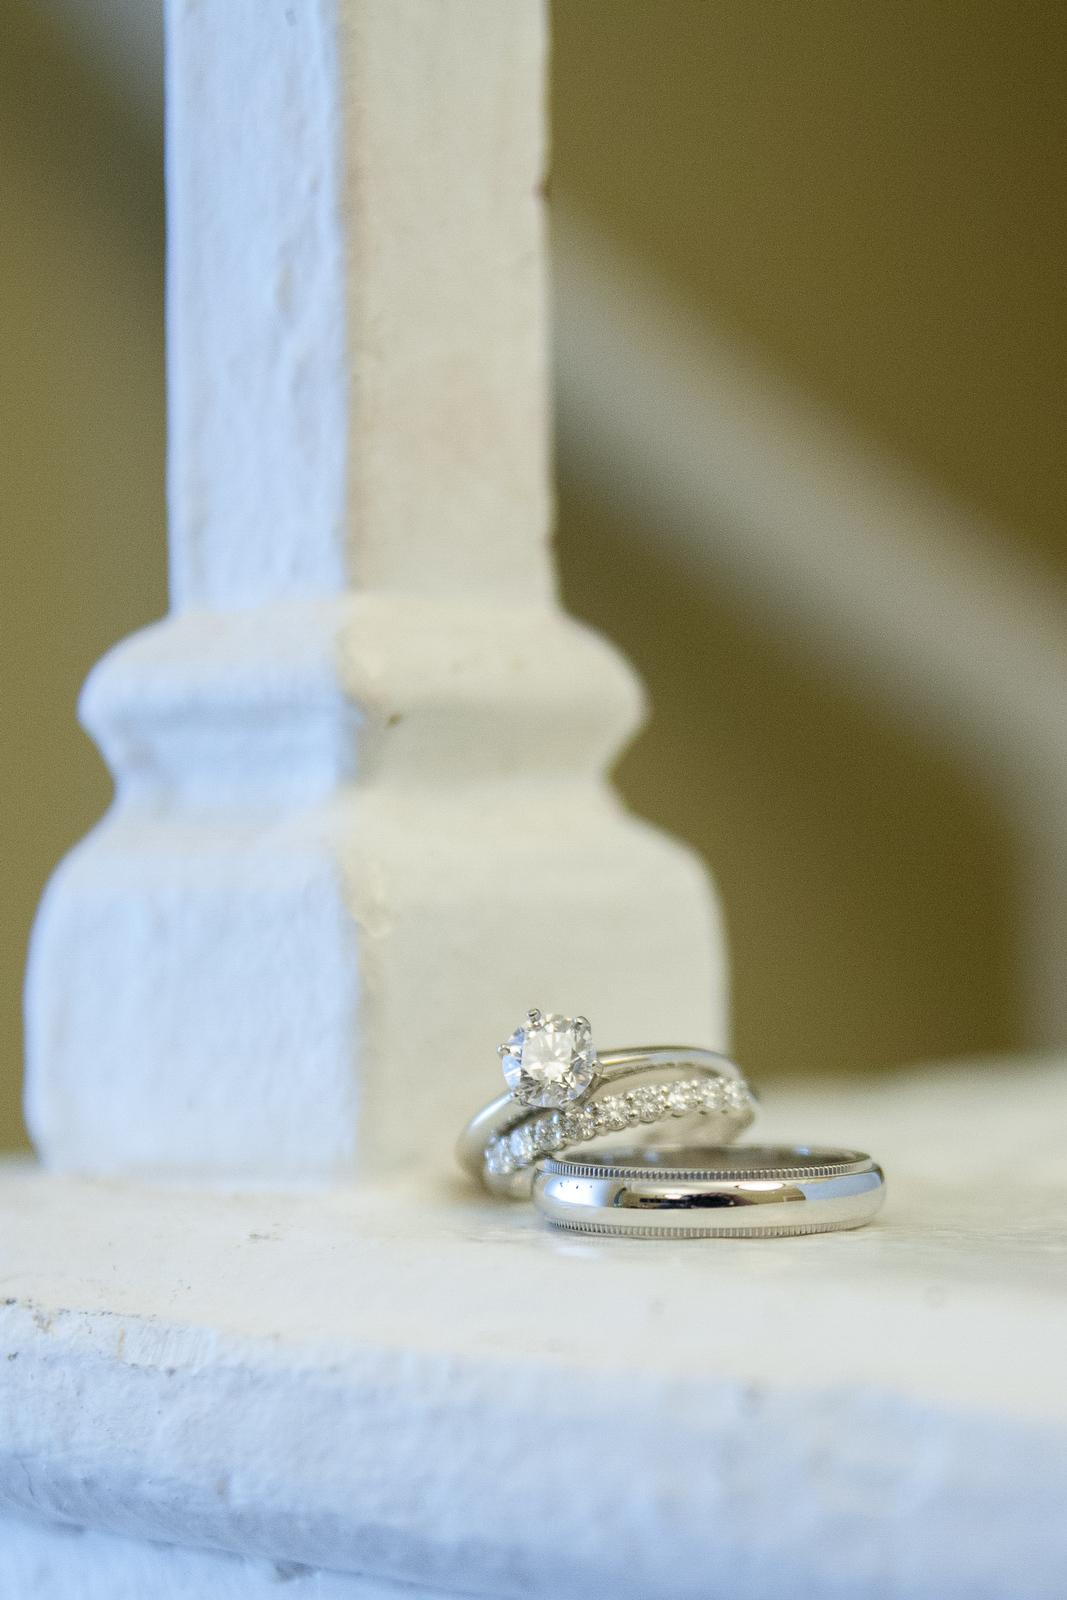 01_Wedding_Prep_014.JPG